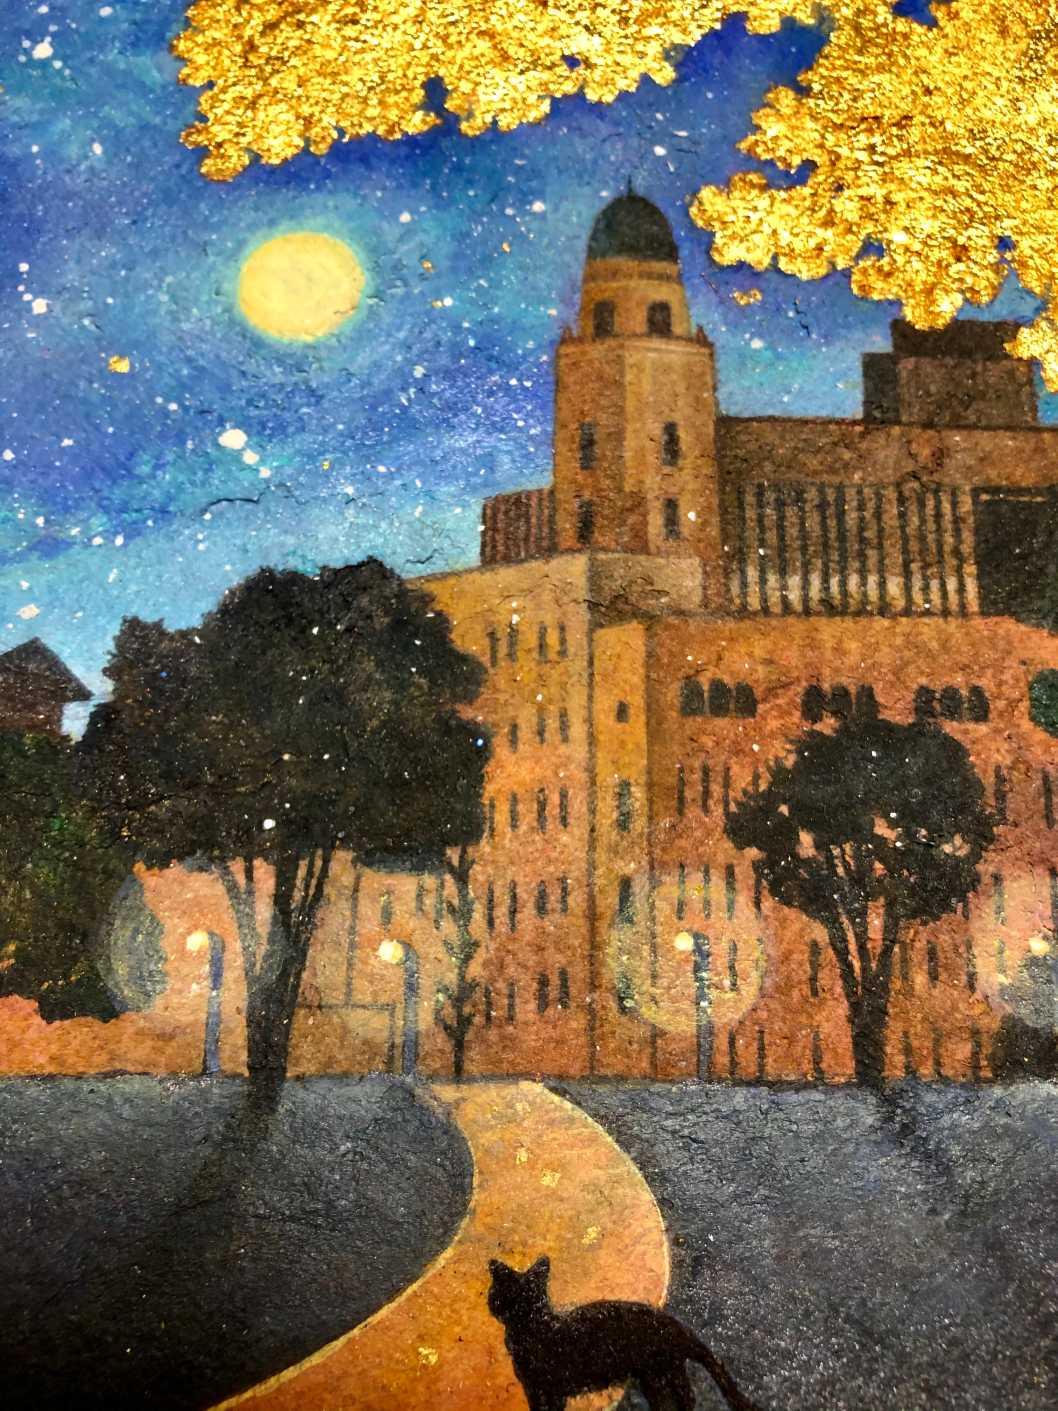 Moonlit Night and Queen Tower